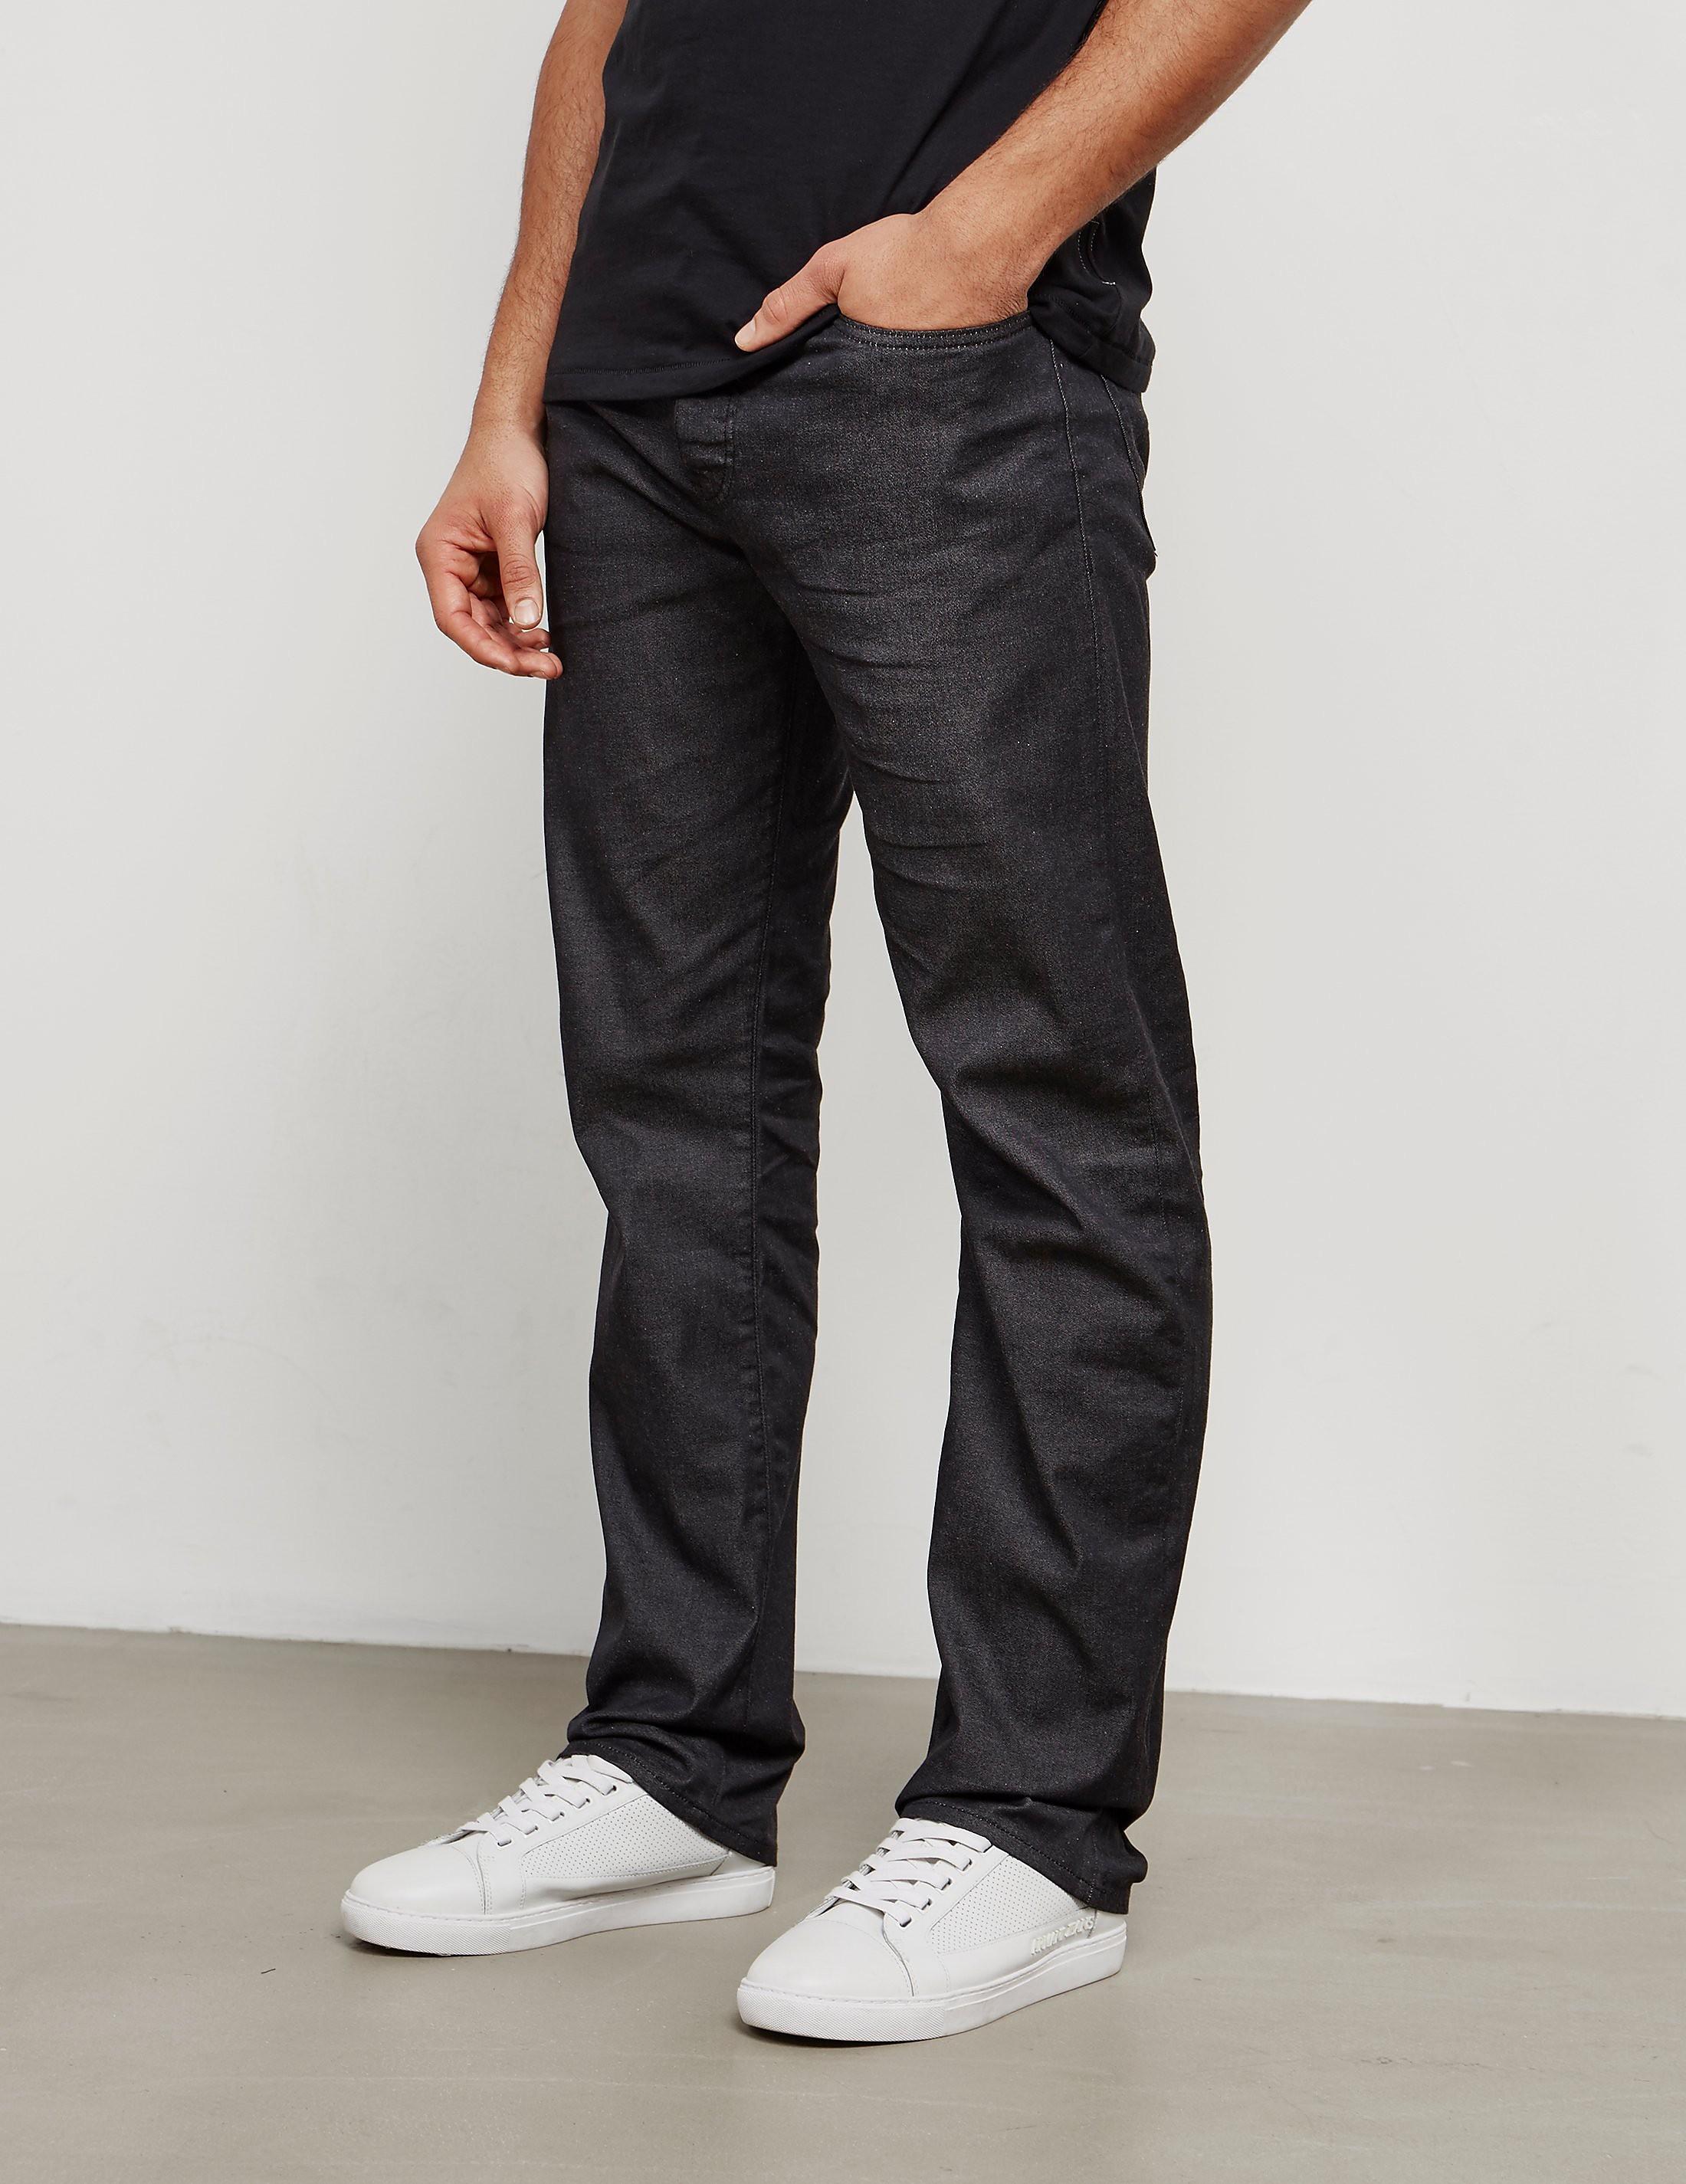 Armani Jeans J21 Jeans